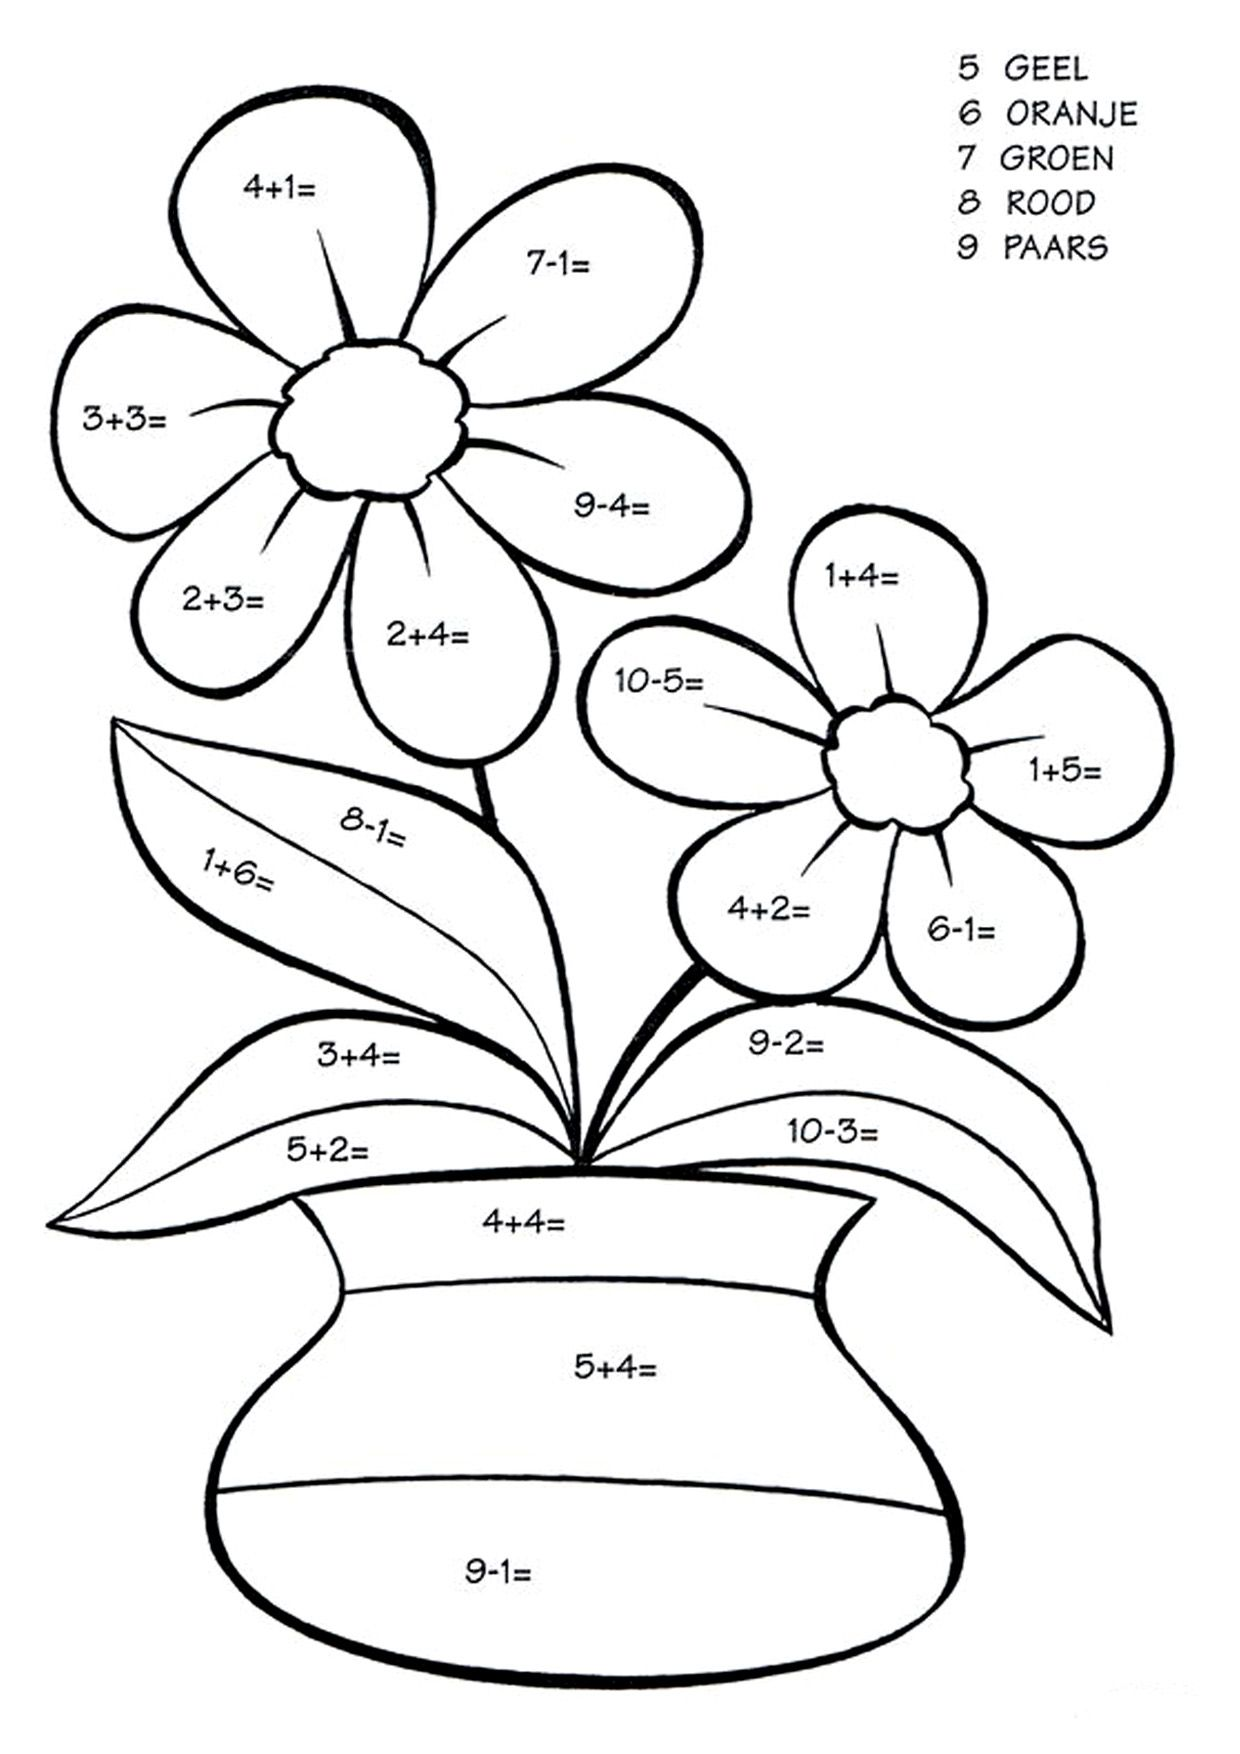 Https S3 Eu Central 1 Amazonaws Com Img Sovenok Co Uk Flowers Maths Colour Maths Colour Flower 0 Math Activities Preschool Math Coloring Kids Math Worksheets [ 1754 x 1240 Pixel ]